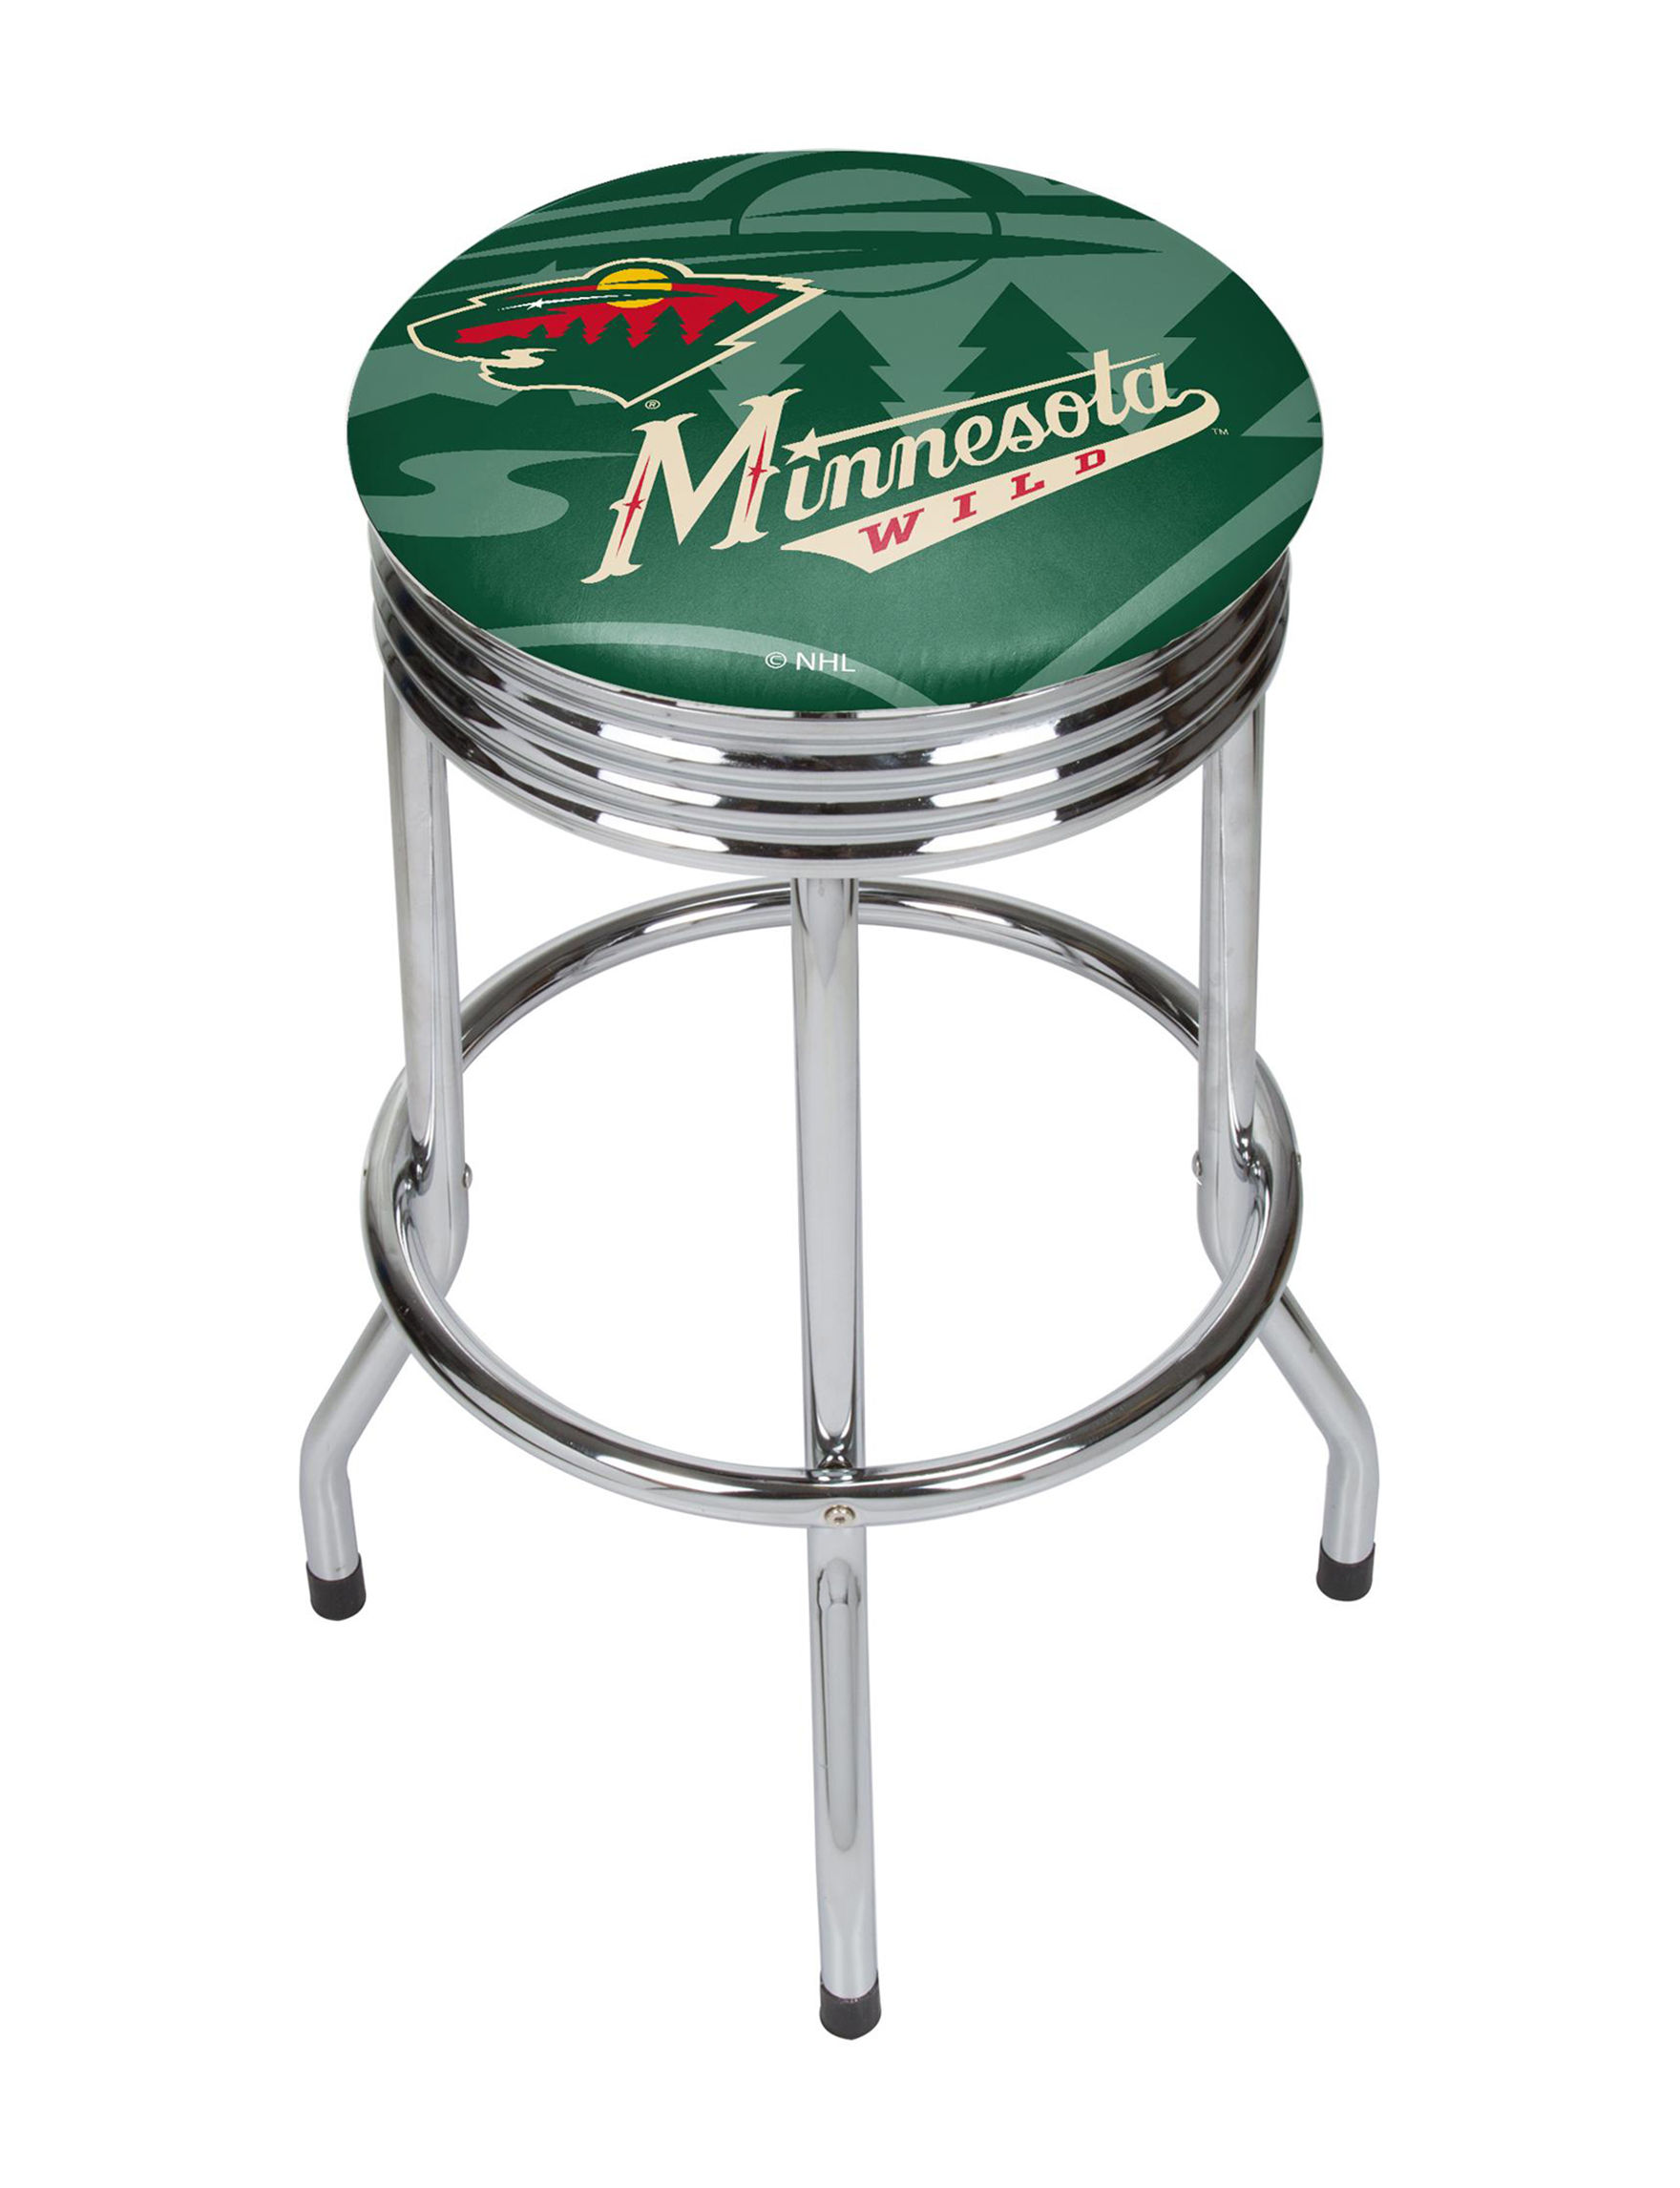 NHL Green / Red Bar & Kitchen Stools Kitchen & Dining Furniture